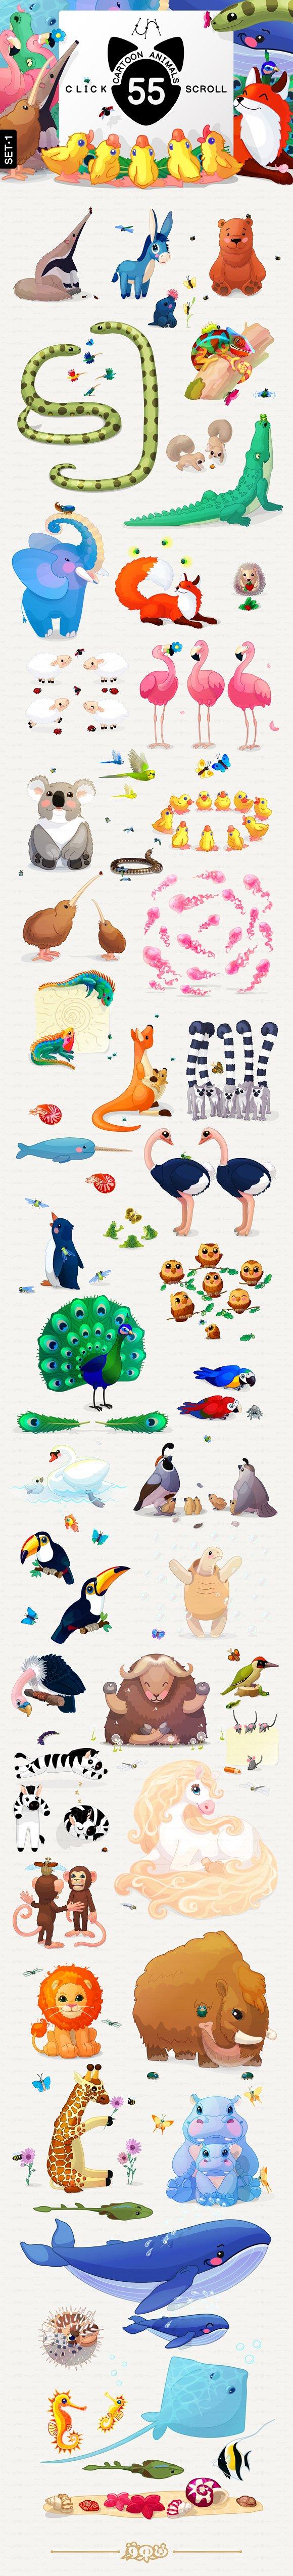 ♥ vector Animals Set 1 in Illustrations